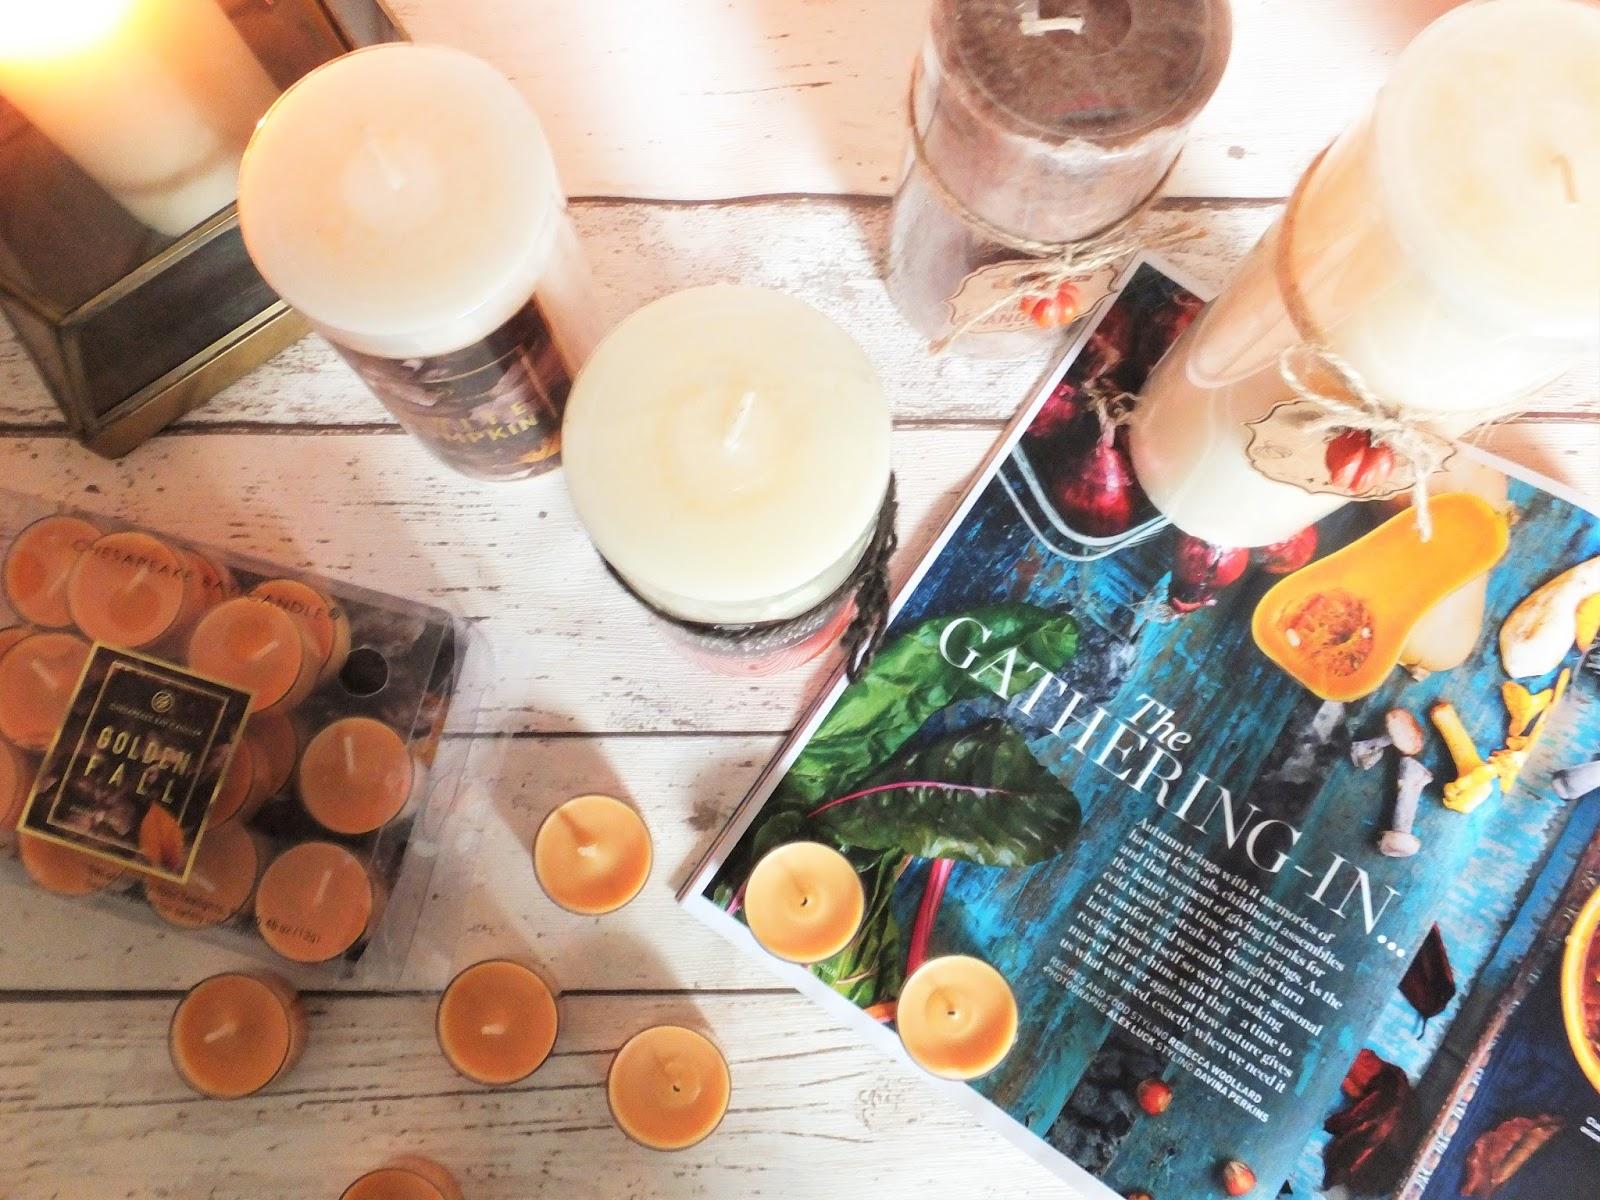 Candles-Magazine-Pumpkin-Lantern